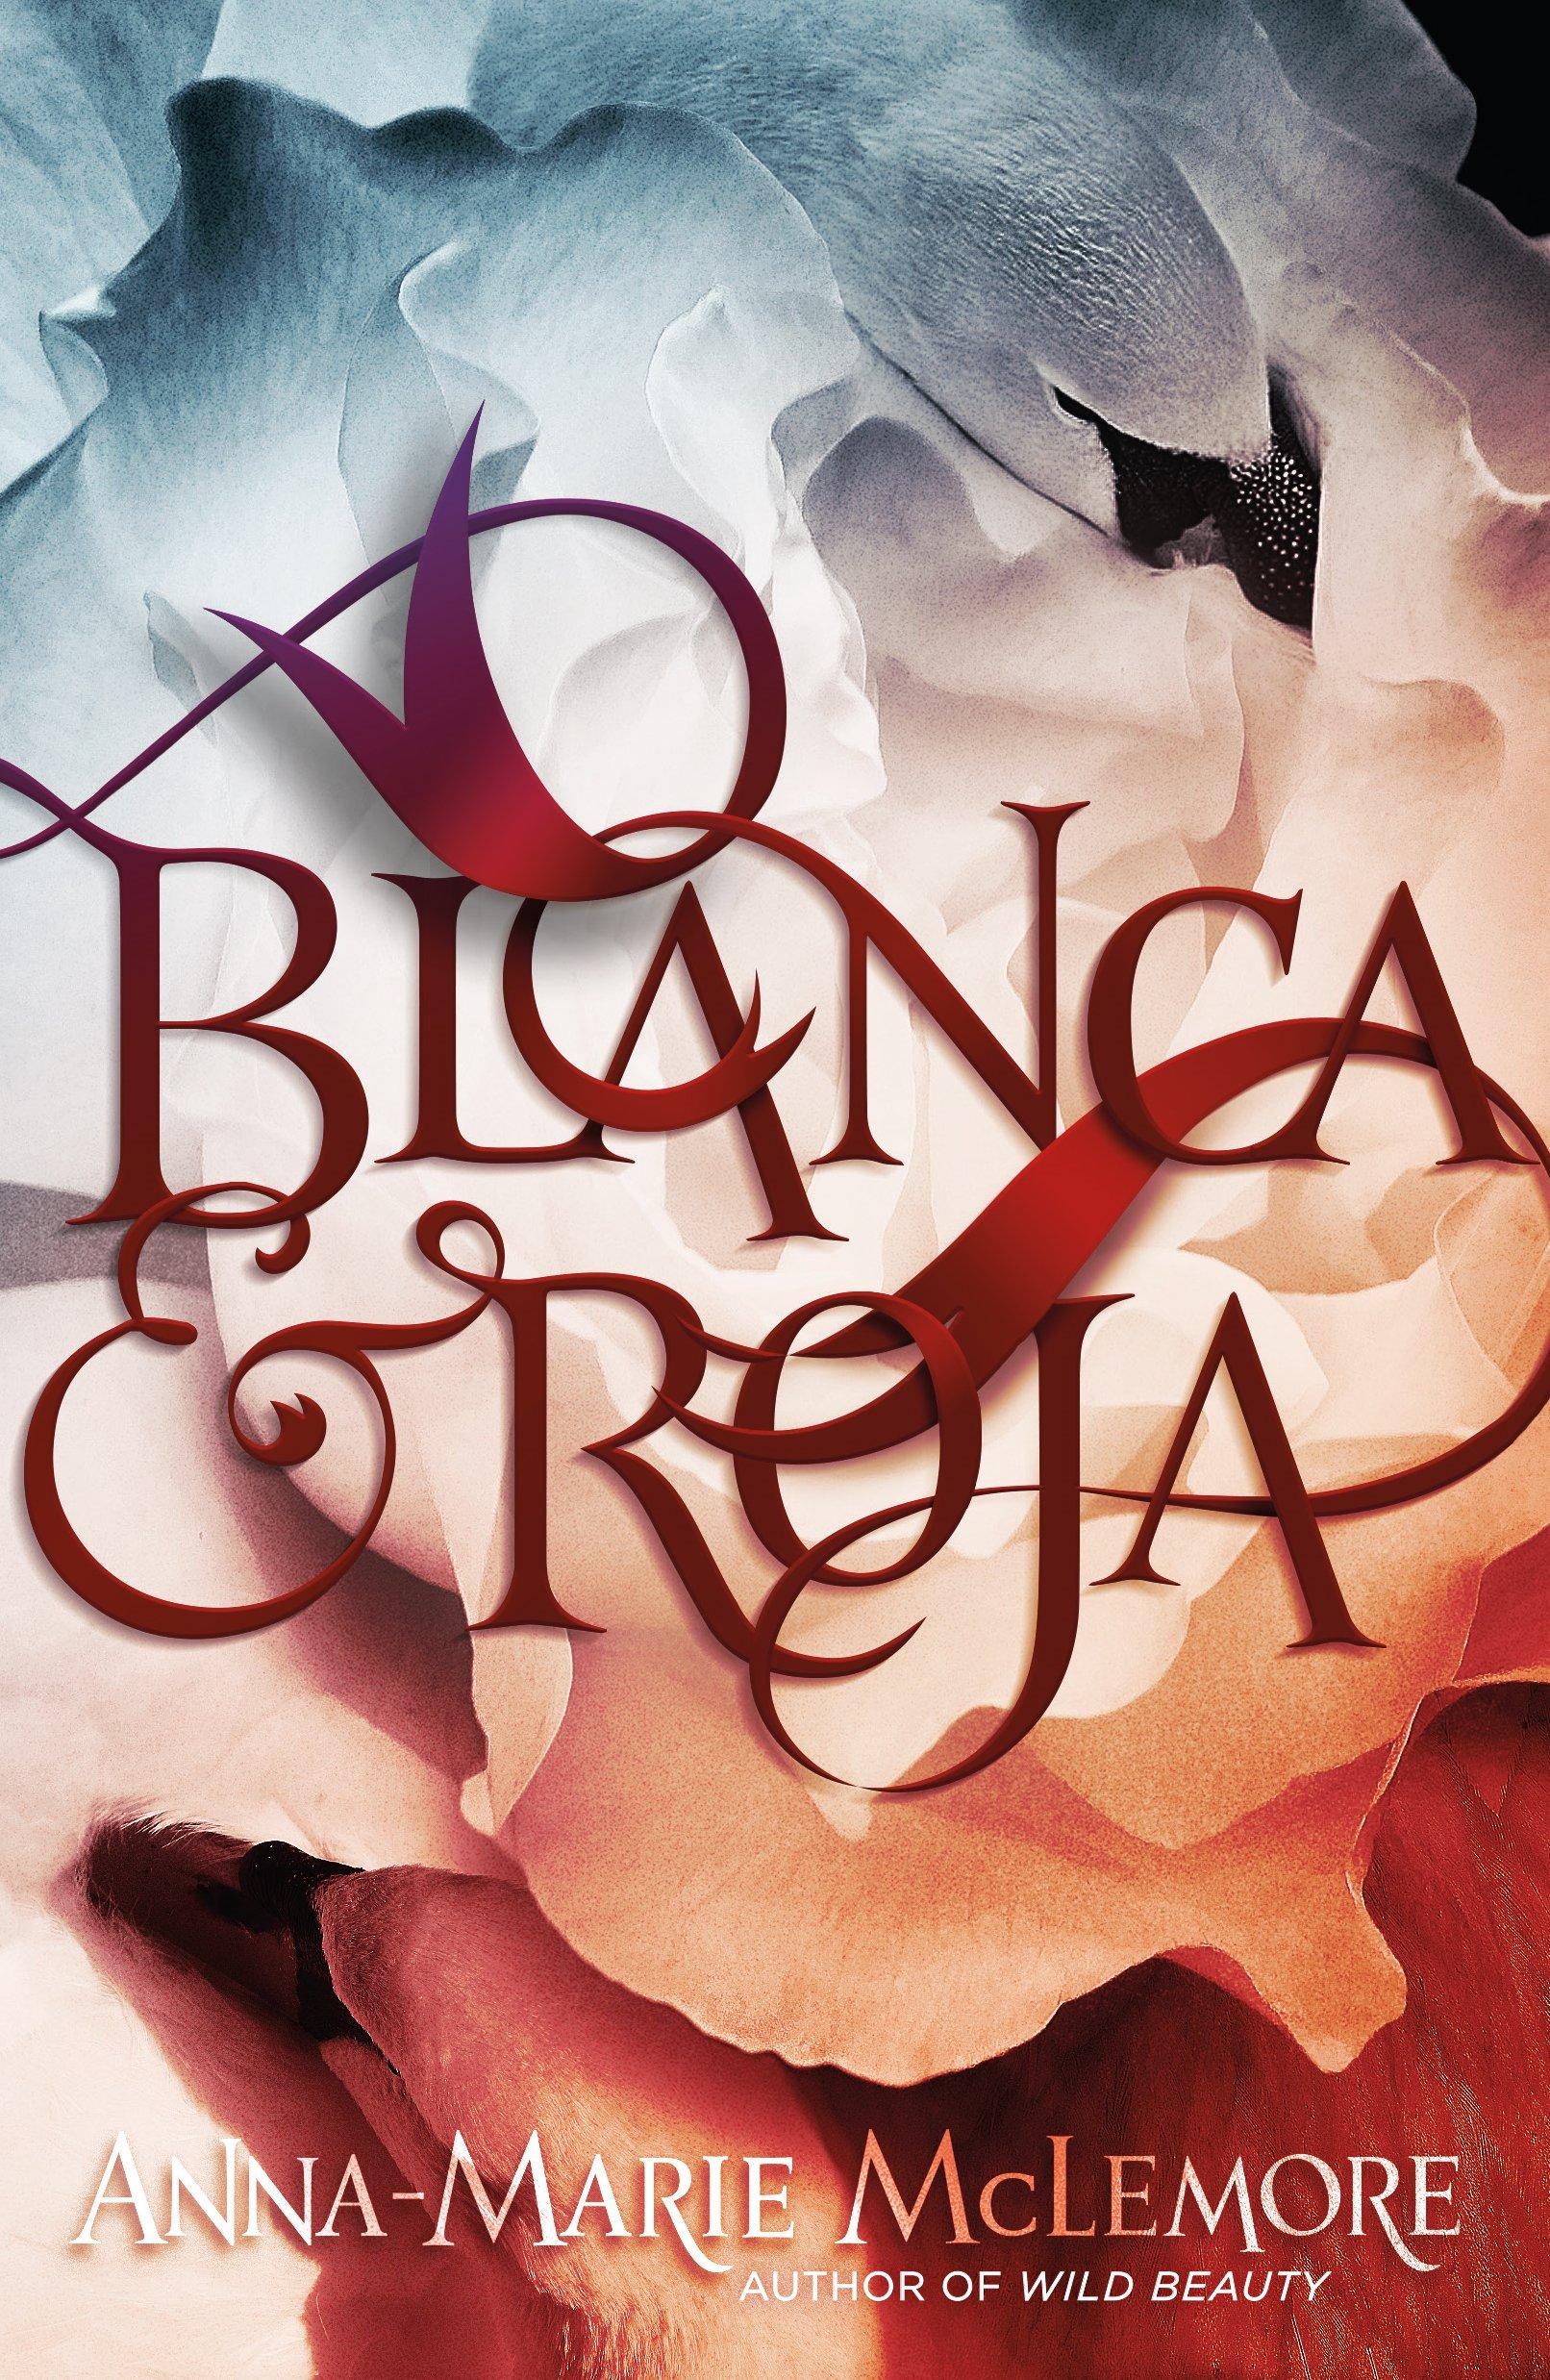 Amazon.com: Blanca & Roja (9781250162717): McLemore, Anna-Marie: Books